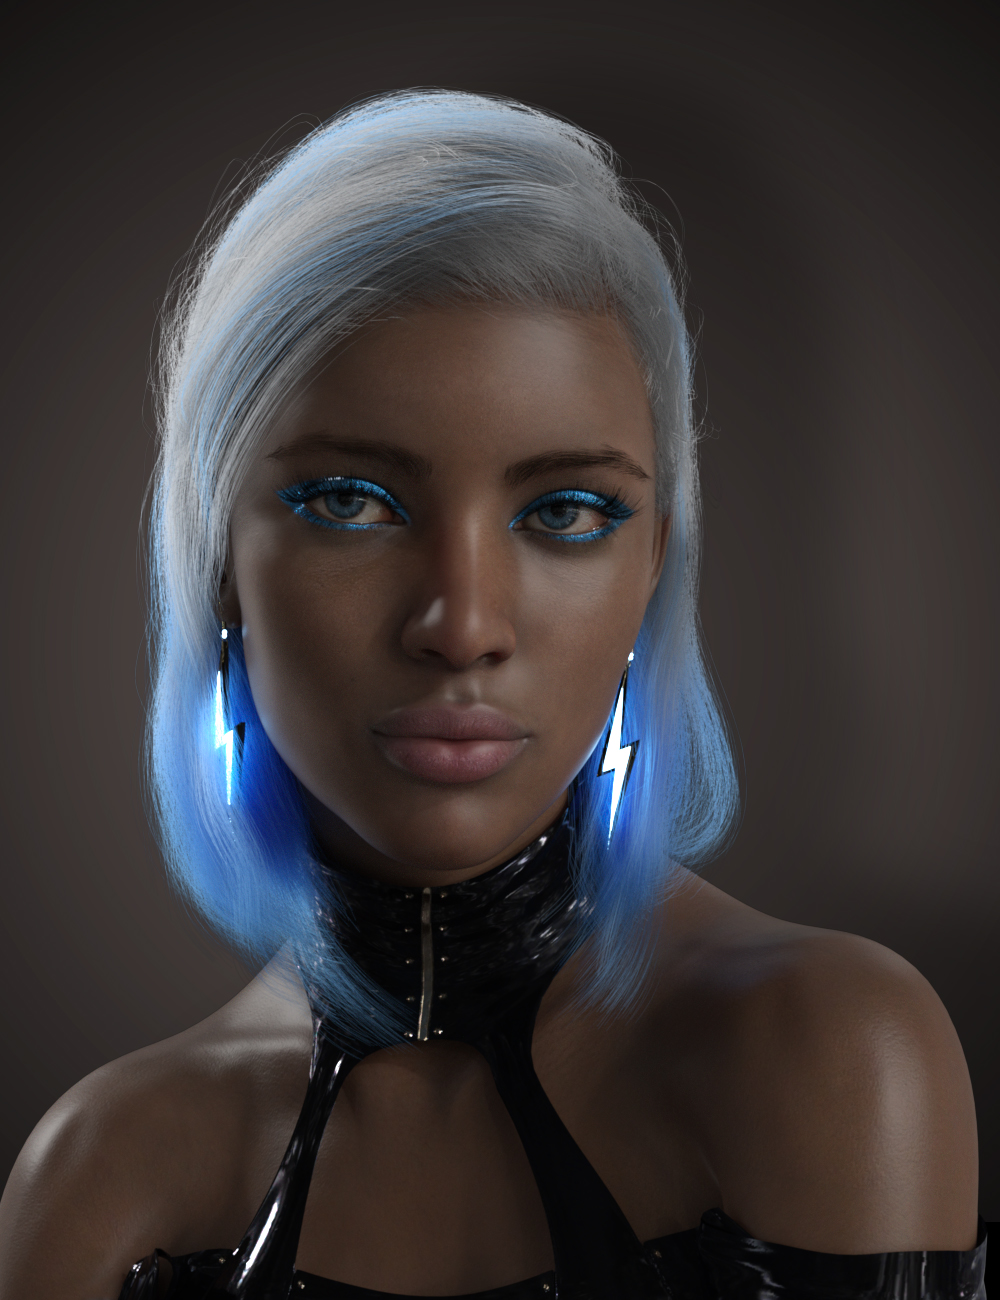 dforce High Voltage Hair for Genesis 3 and 8 Females_DAZ3D下载站